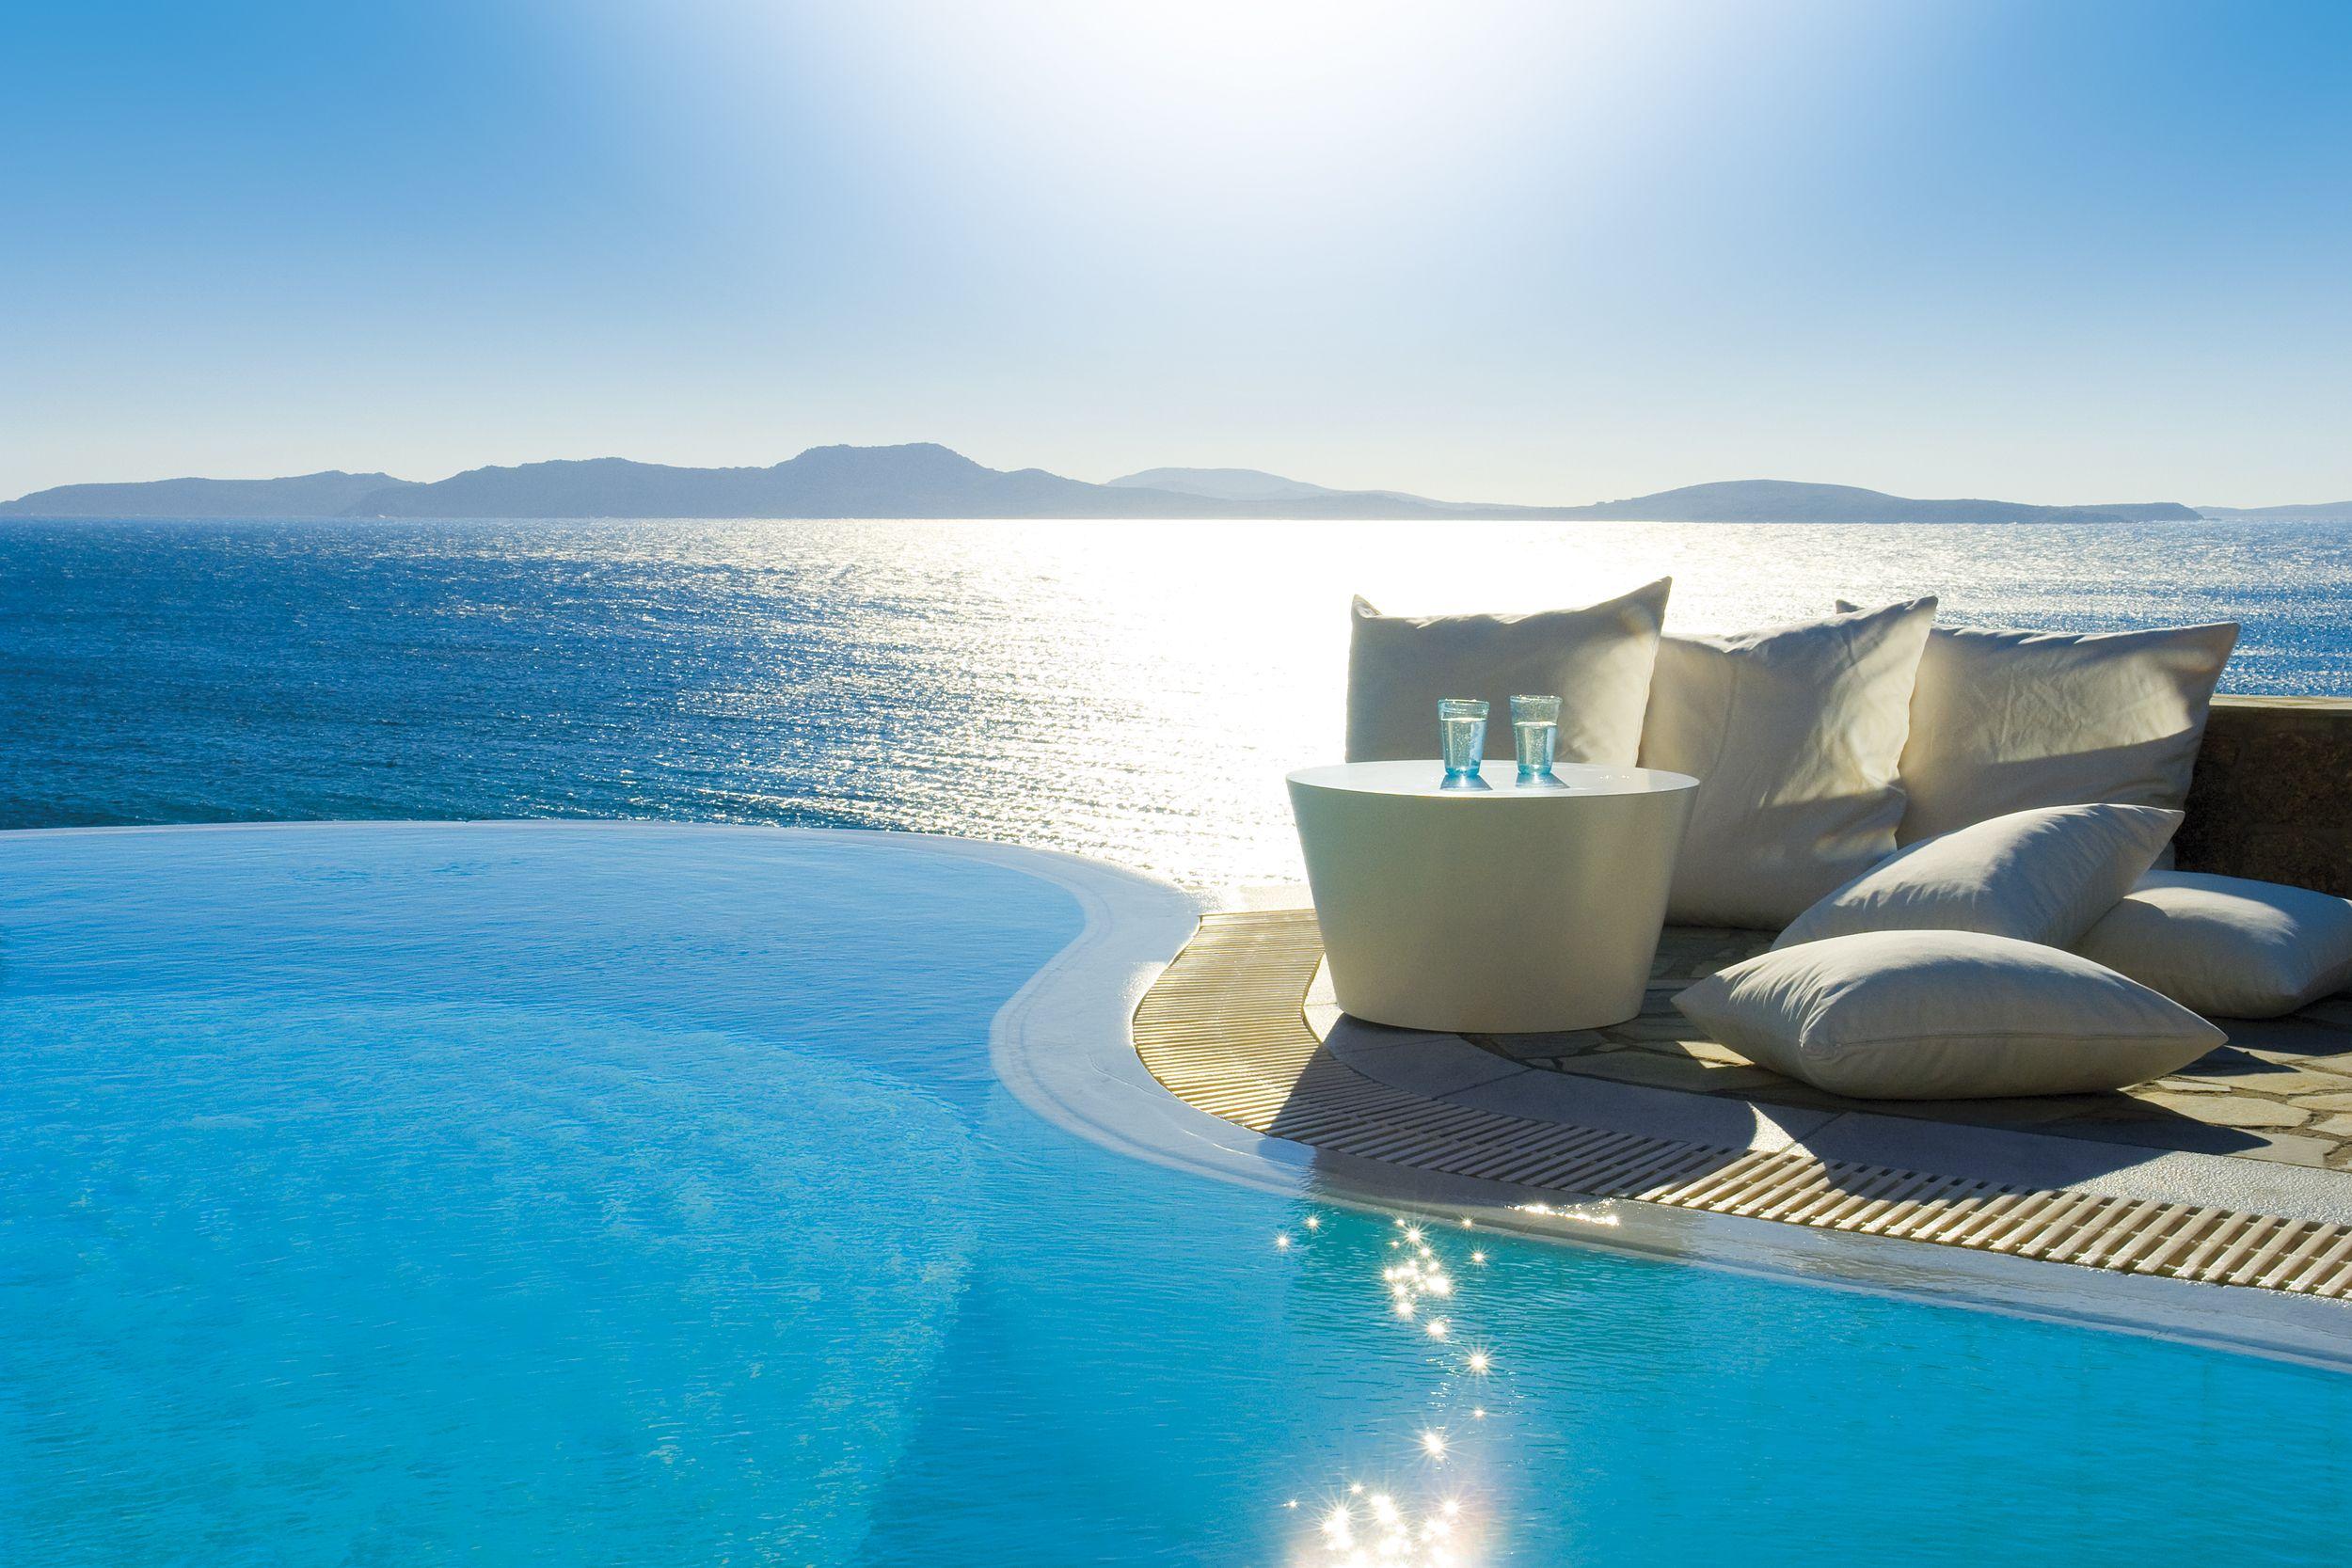 Infinity pool outdoors pinterest grand hotel mykonos and deep blue sea - Small infinity pool ...